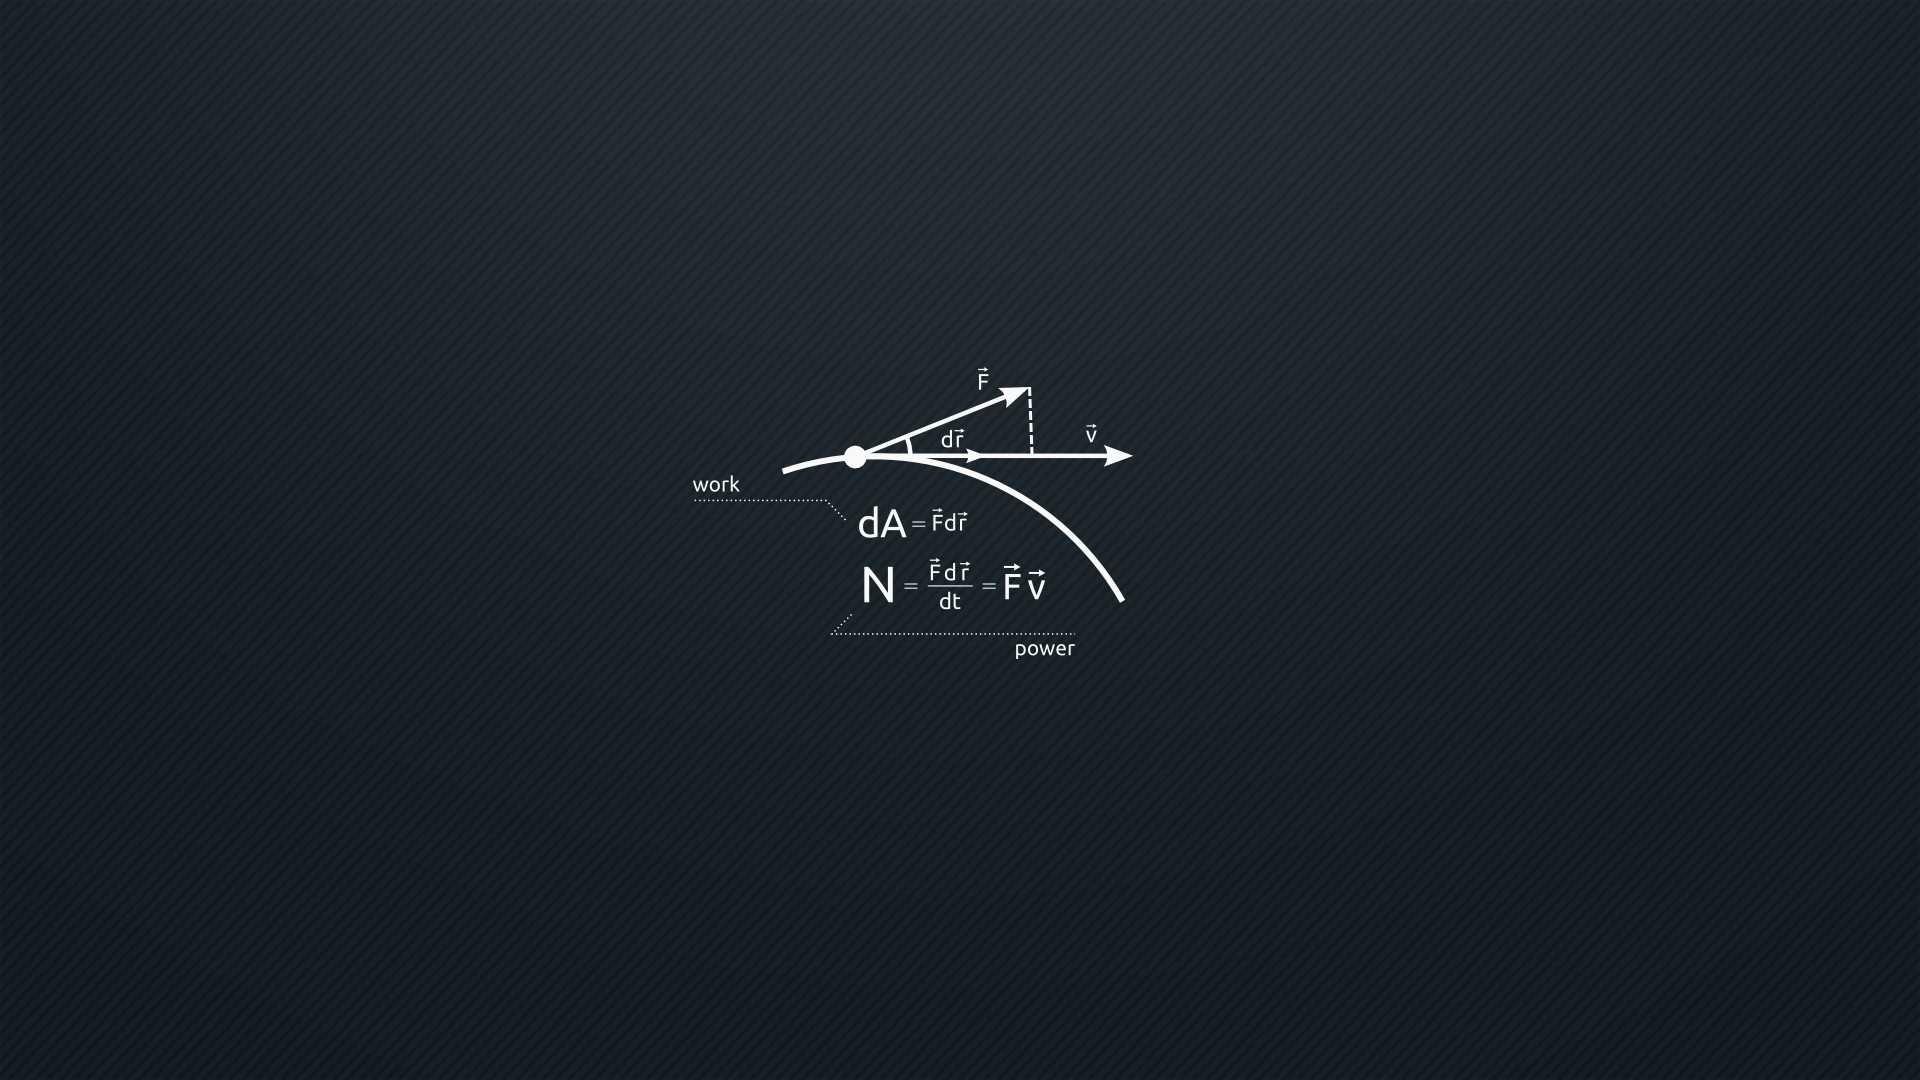 1080p minimalist wallpaper 90 images